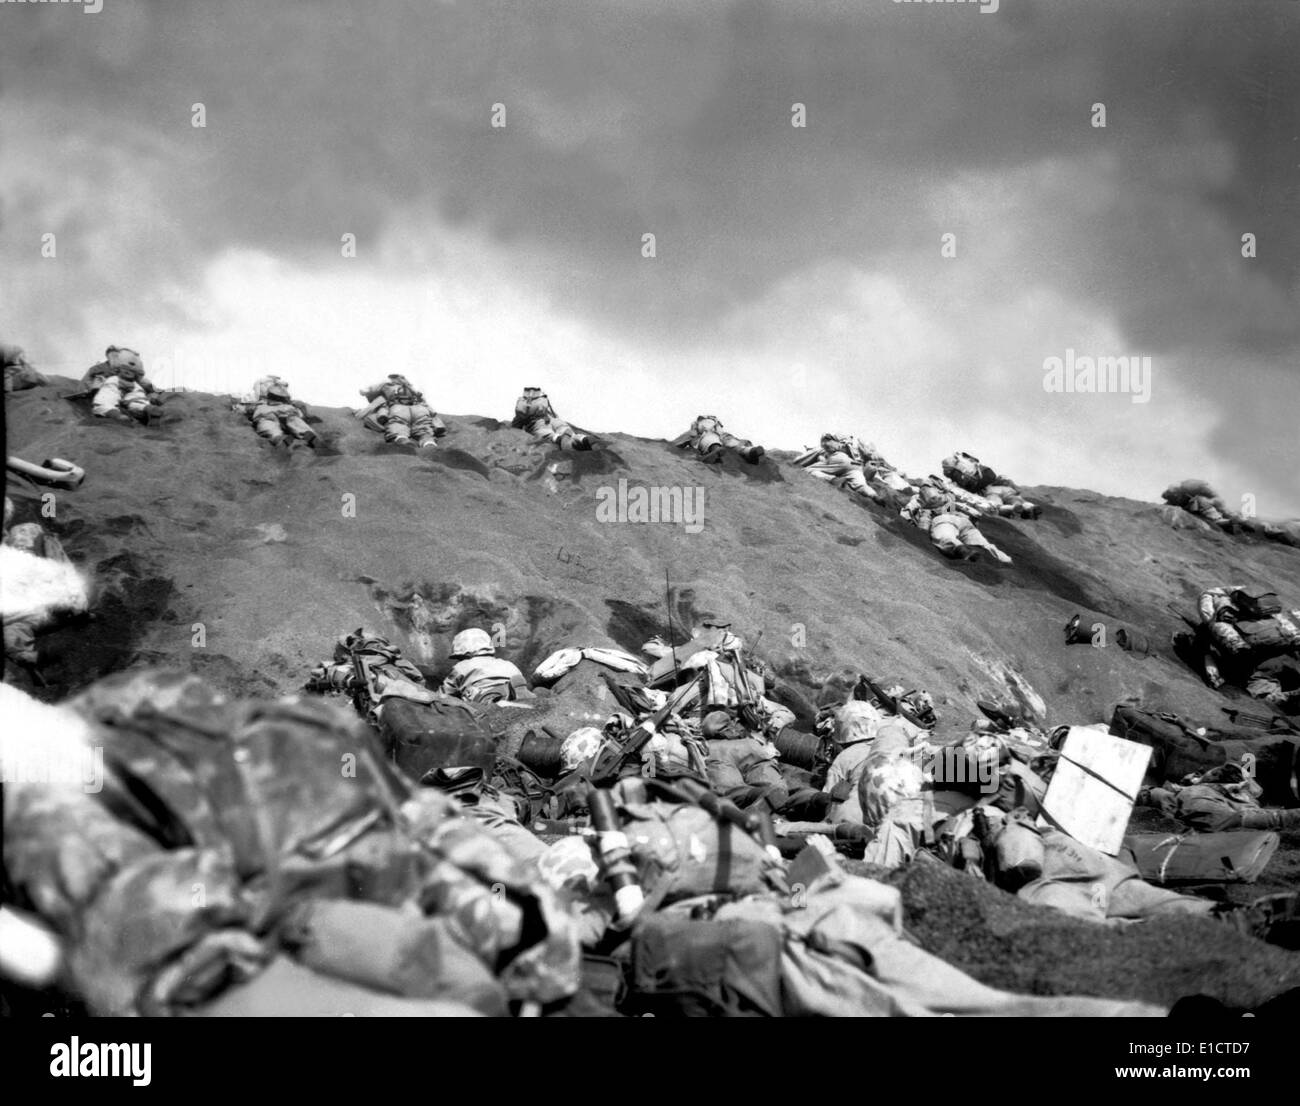 5th Division Marines crawl up a slope on Red Beach No. 1 toward Mt. Suribachi on Iwo Jima. Feb. 19, 1945. World Stock Photo